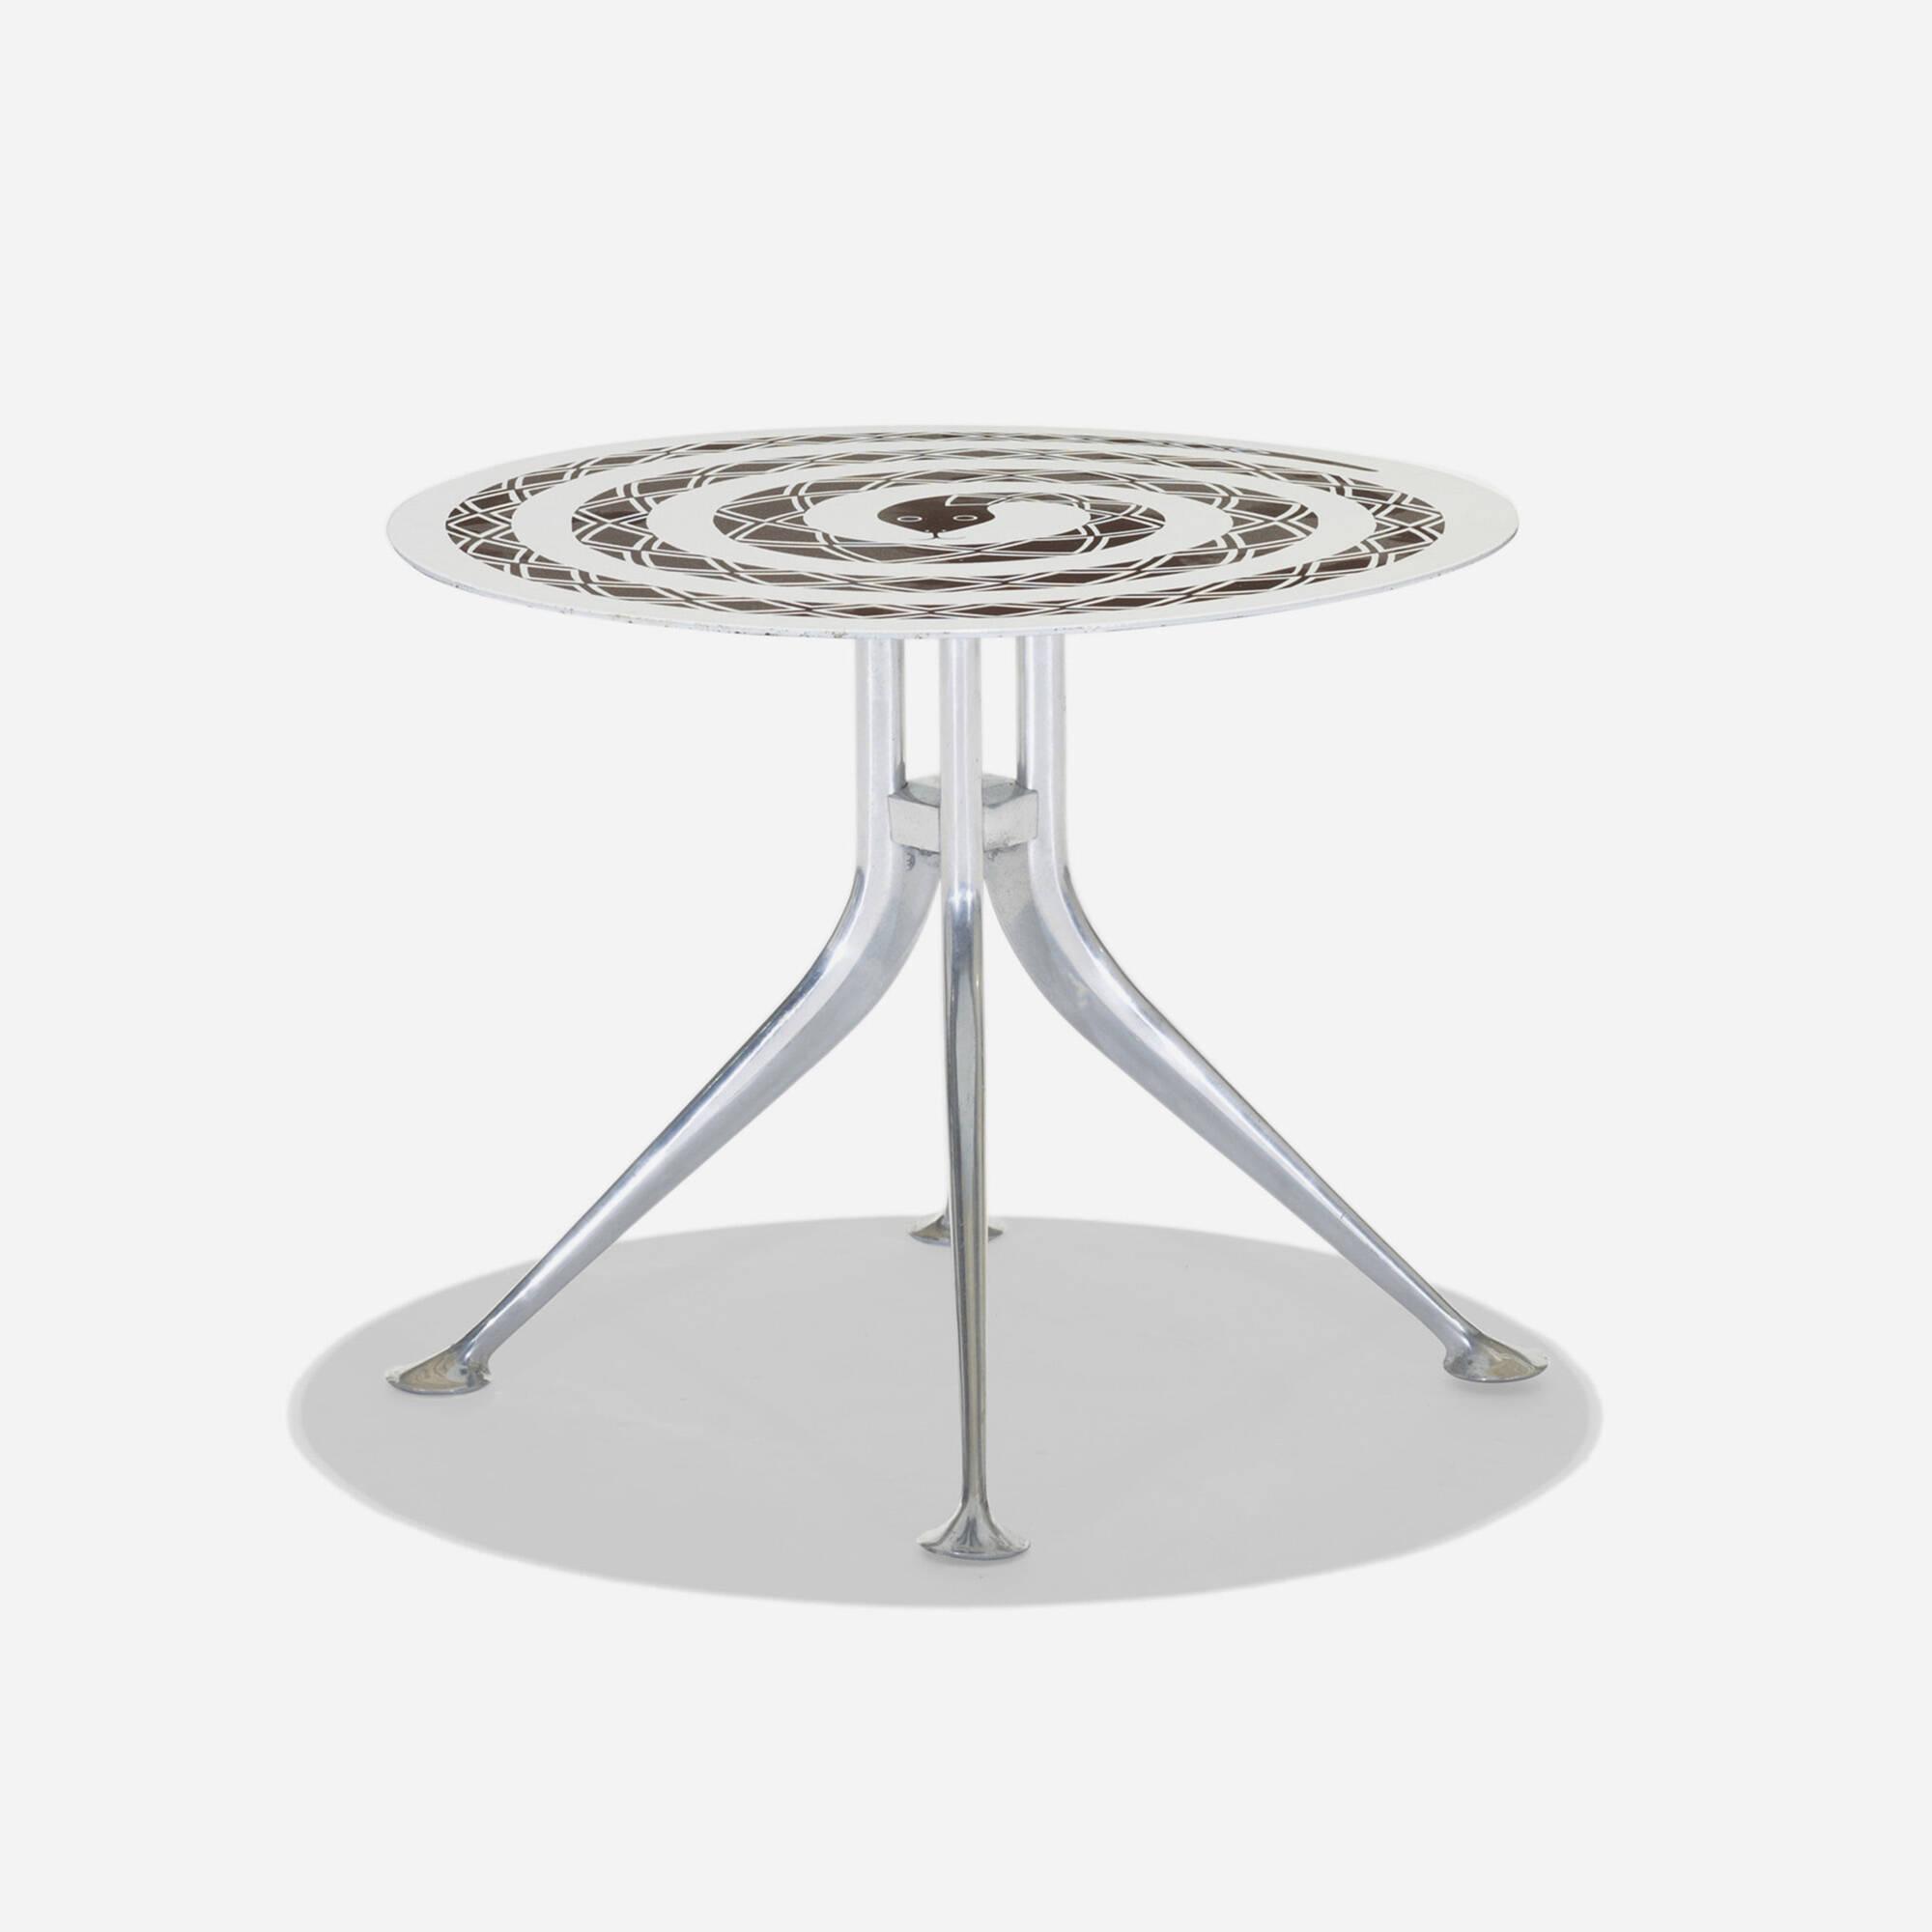 431 Alexander Girard Snake occasional table Modern Design 18